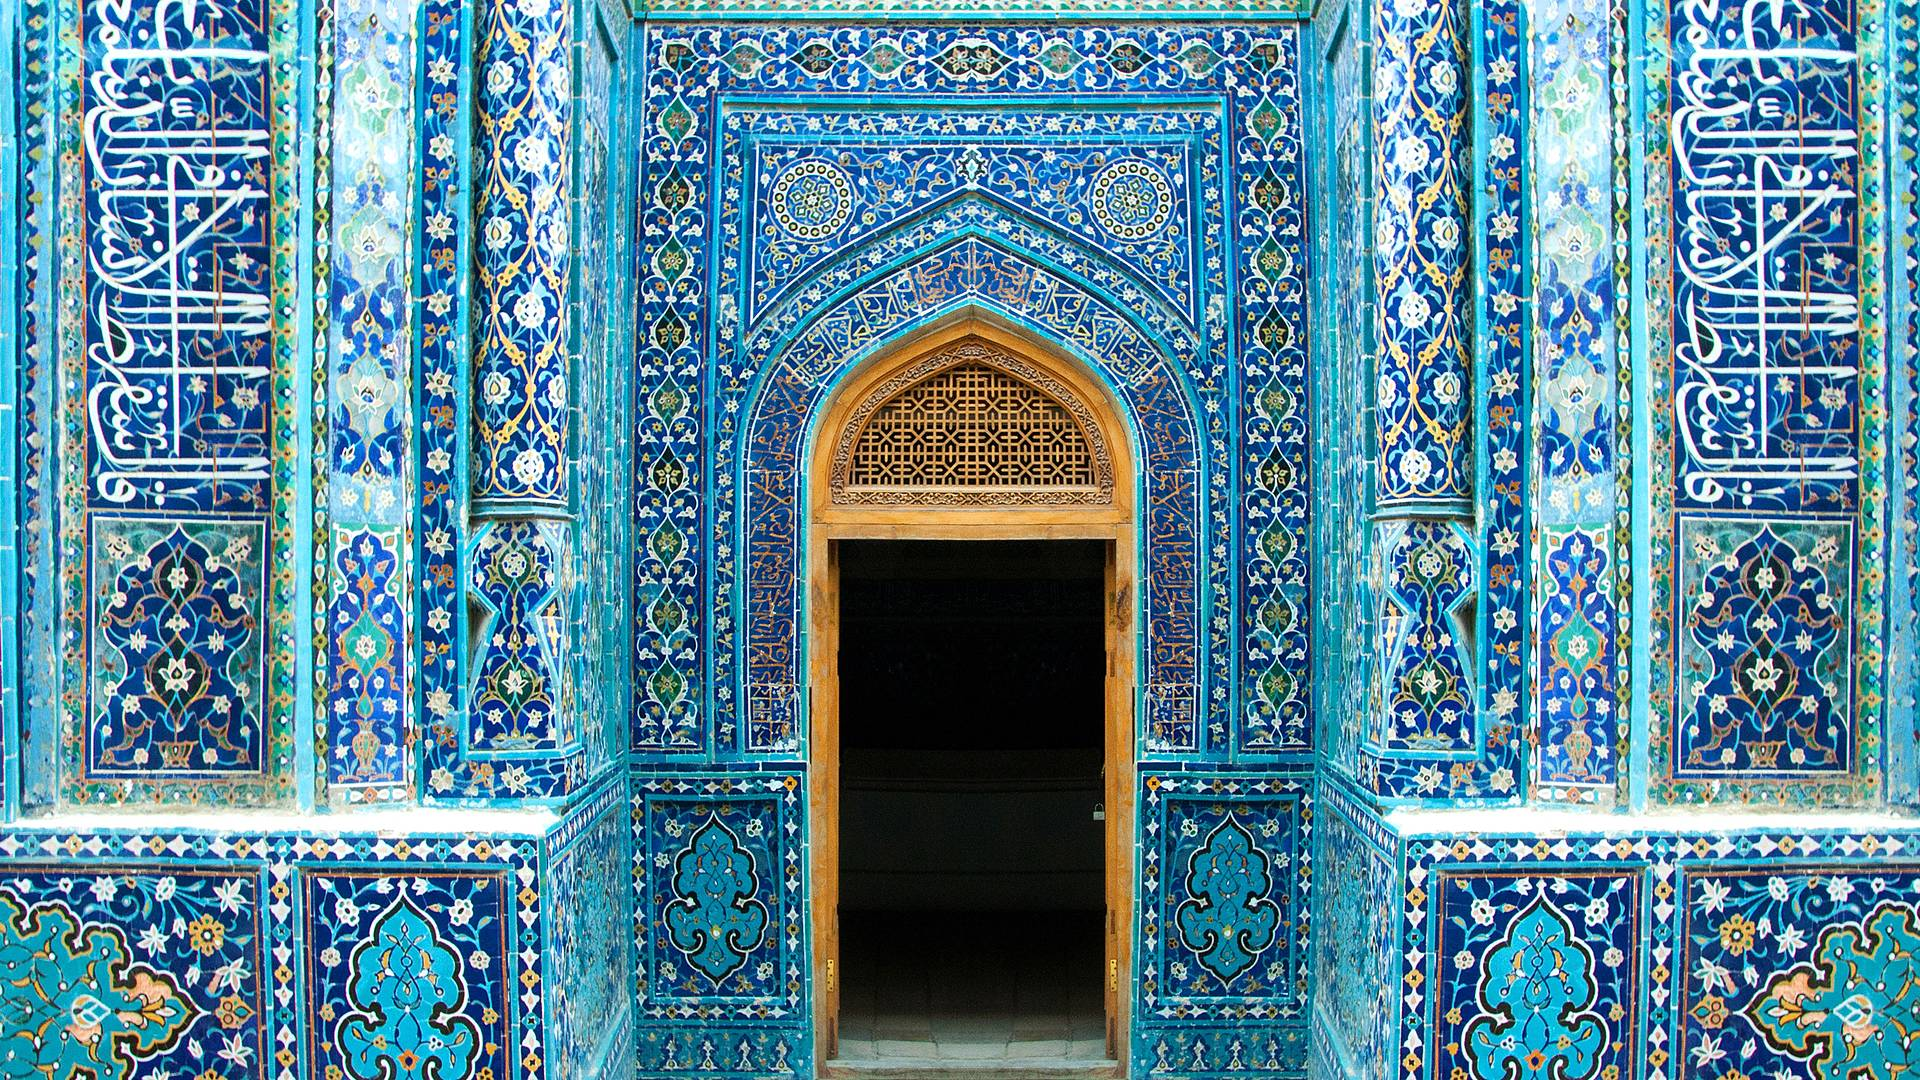 Viajando de Uzbekistán, Kirguistán hasta Taykistán